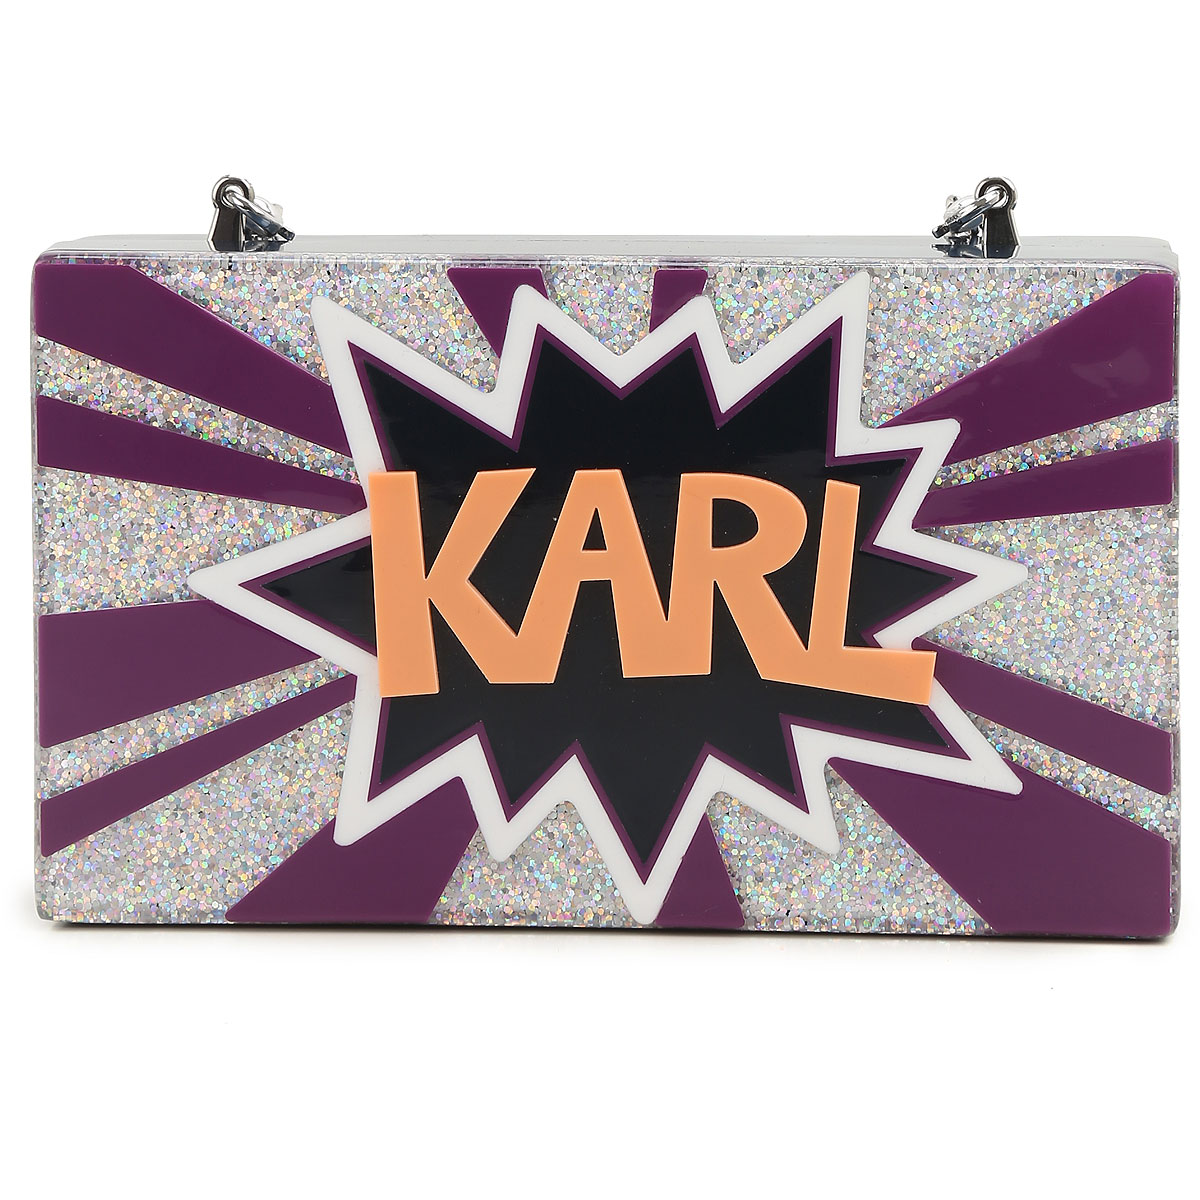 Karl Lagerfeld Clutch Bag On Sale, Multicolor, Acrylic, 2019